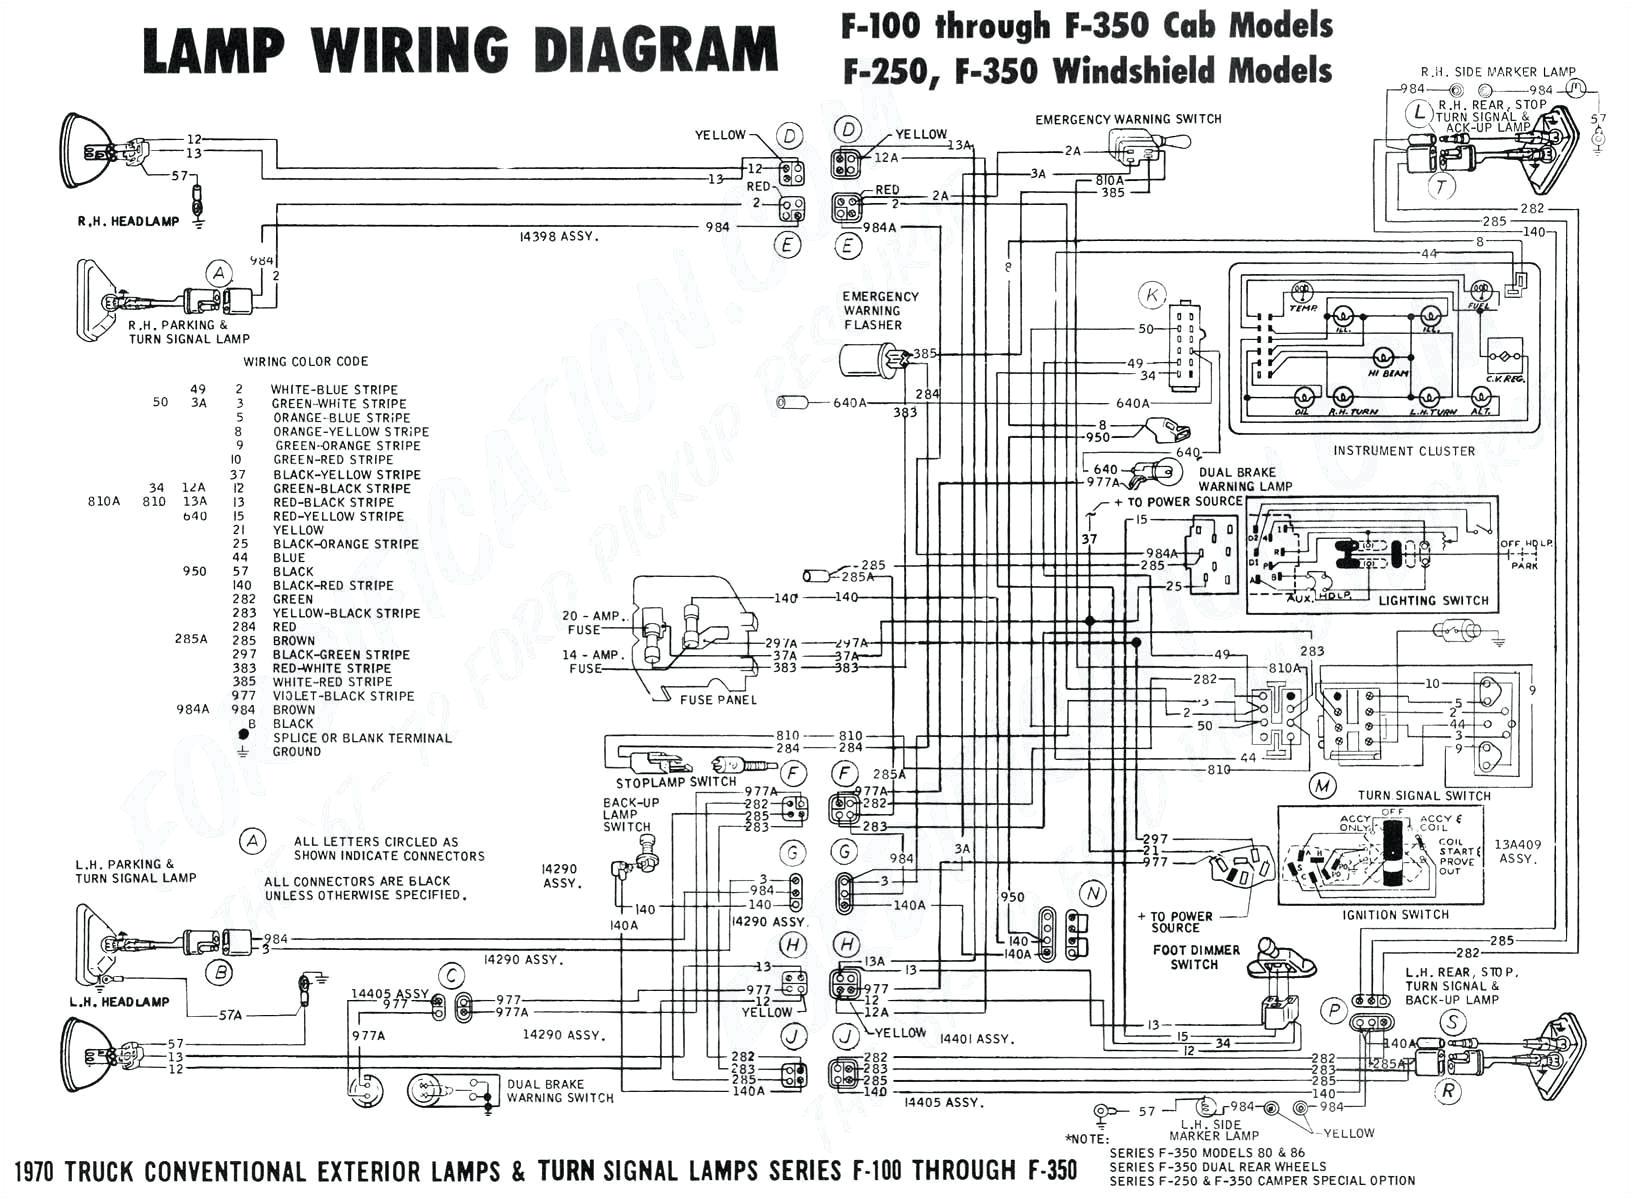 fuse box 98 toyota corolla wiring diagrams konsult 99 toyota corolla radio wiring diagram 2006 volvo